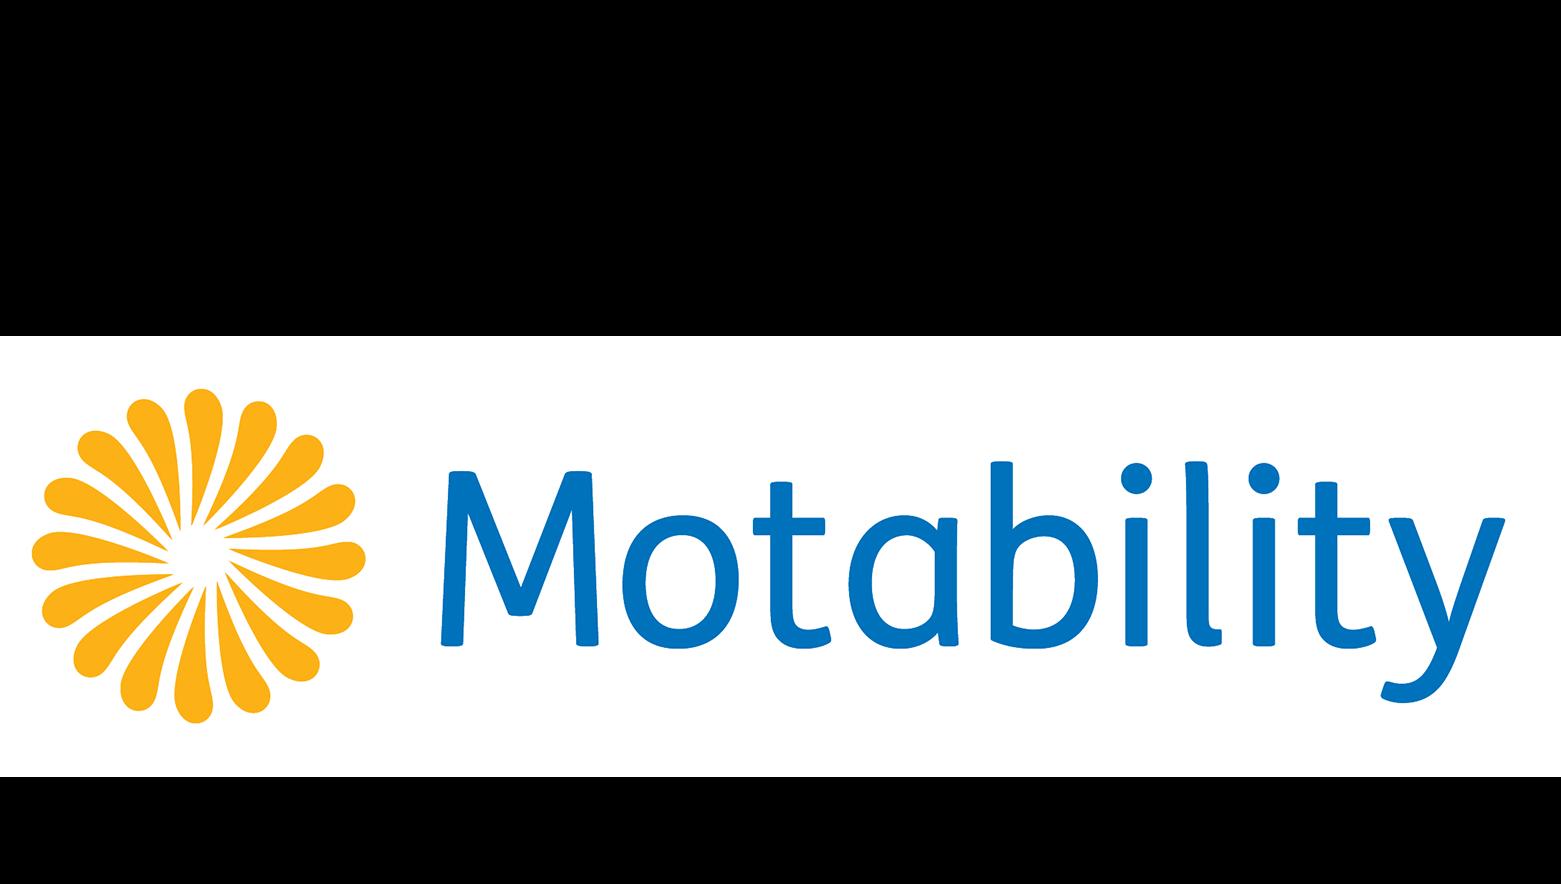 The Motability Logo